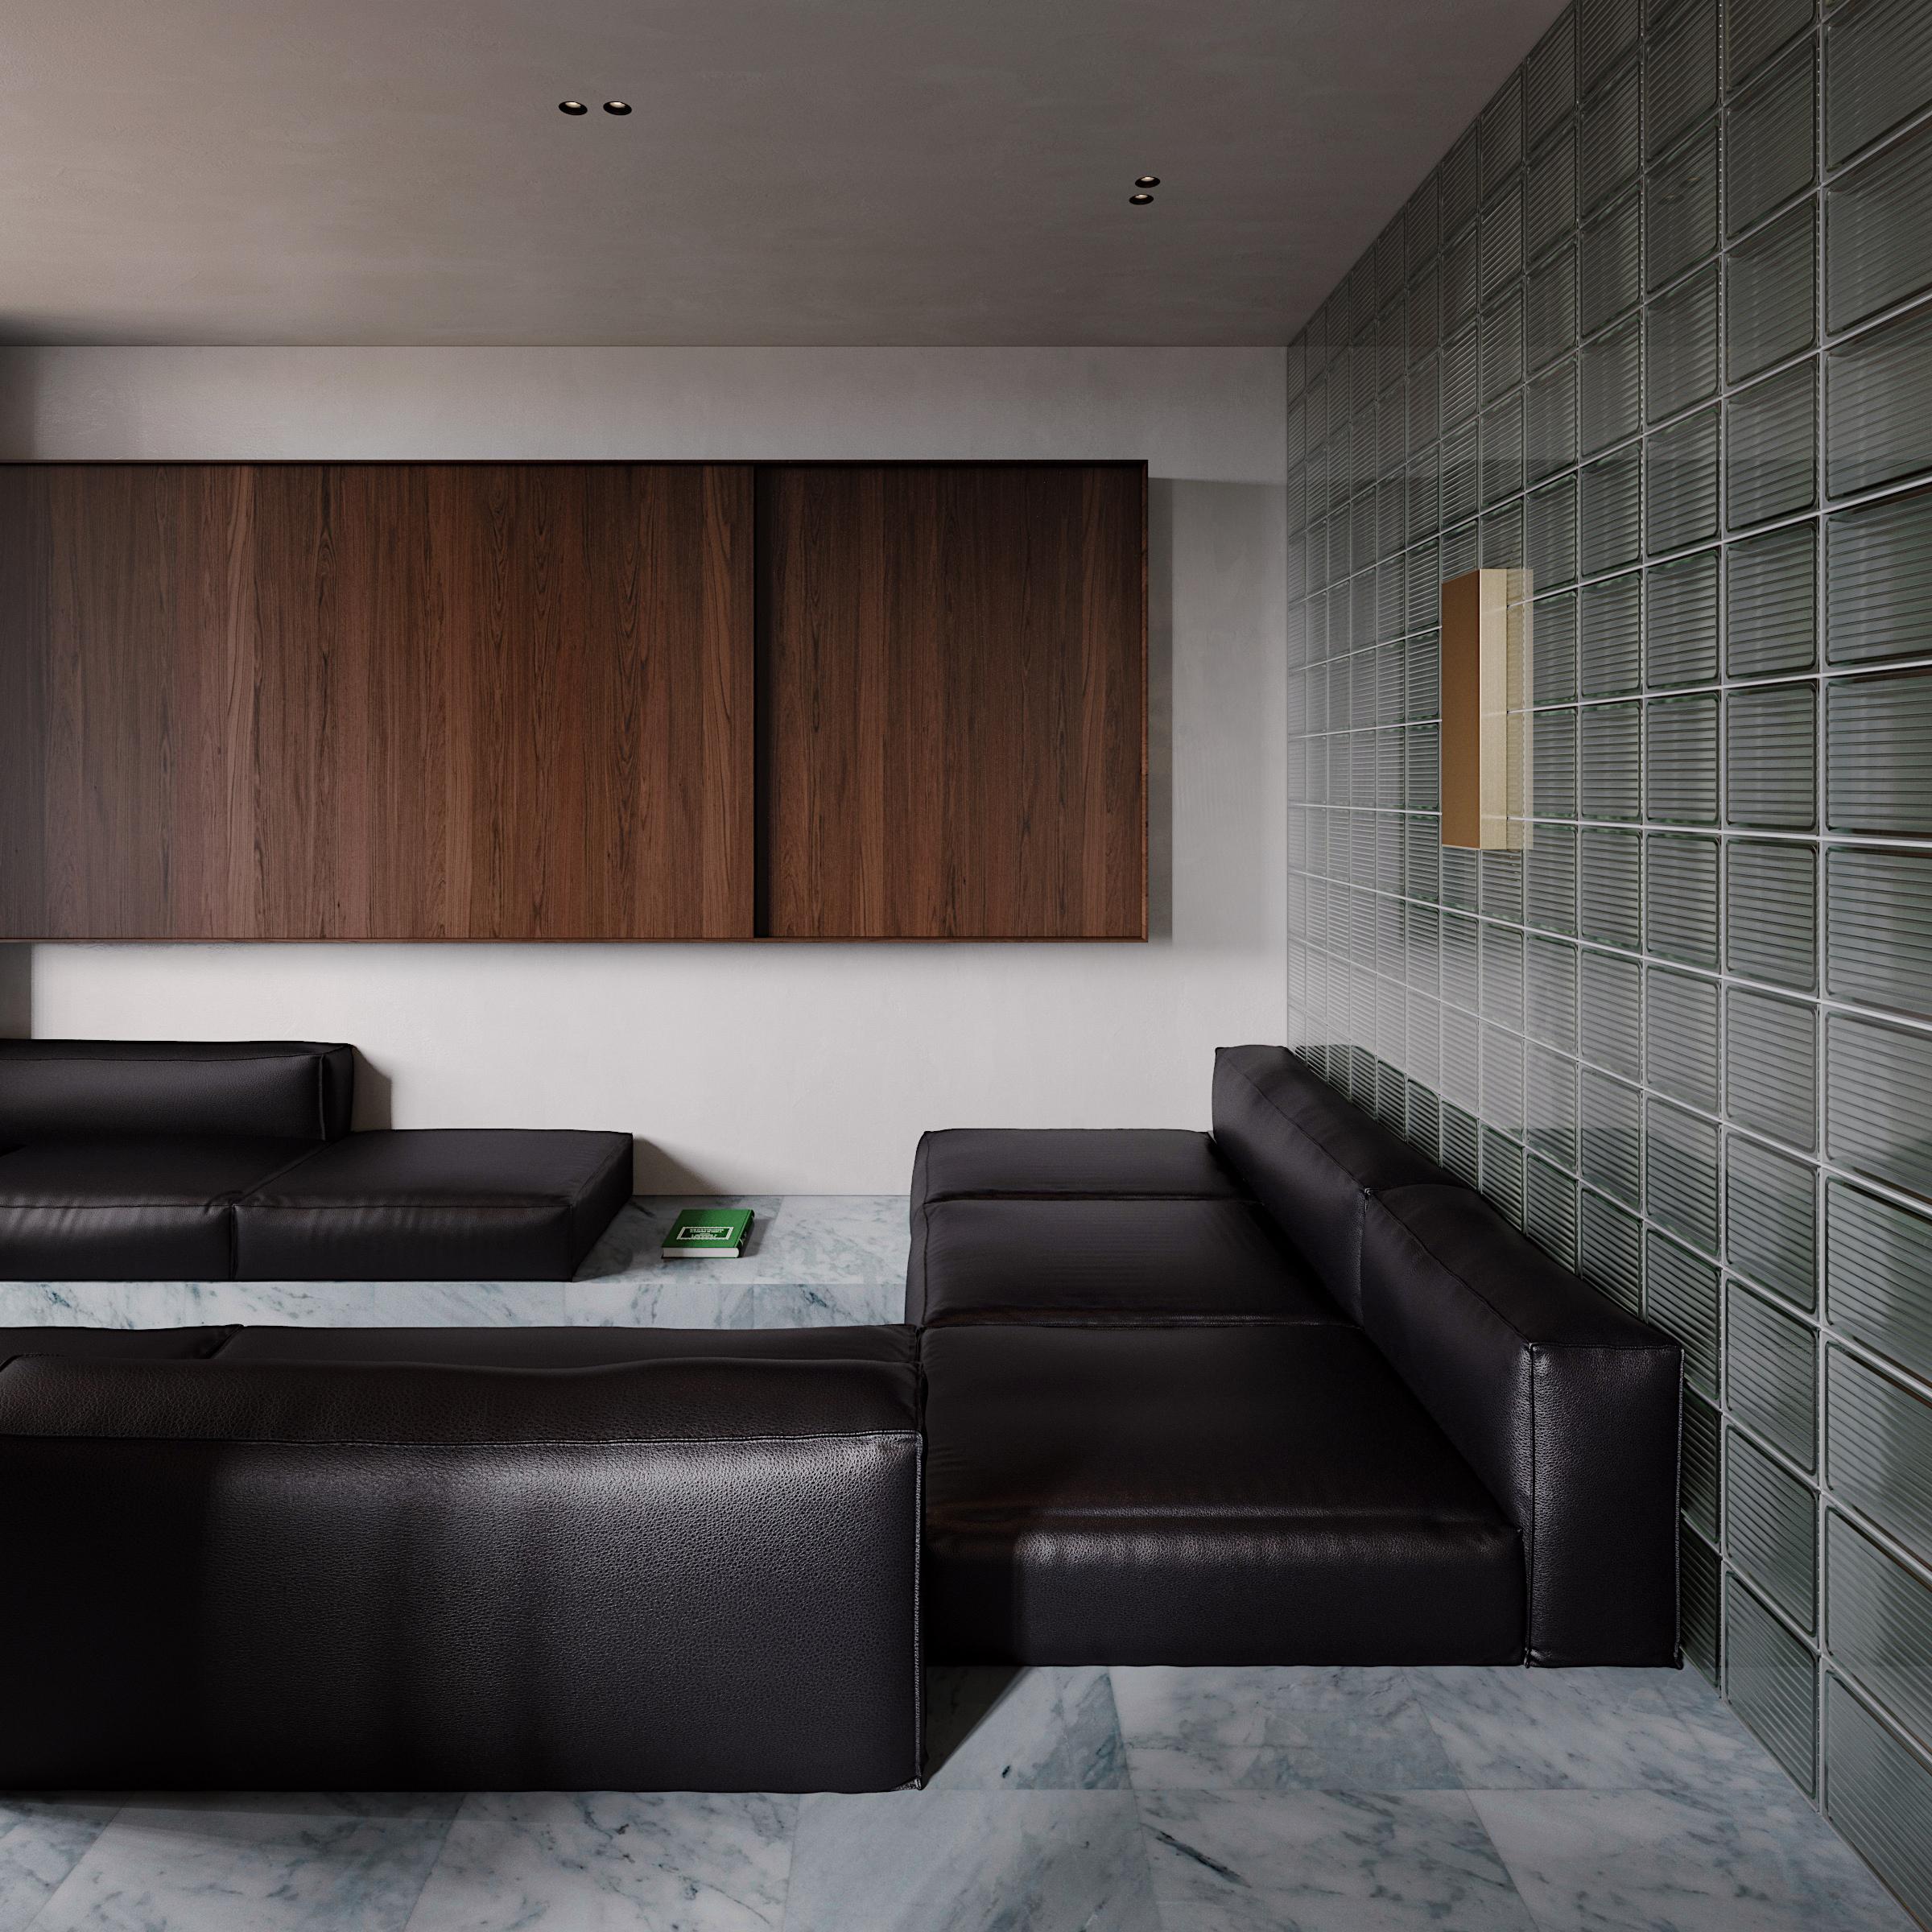 MRBL project Artem Trigubchak leather sofa gass blocks wall marble wood shelf plaster walls